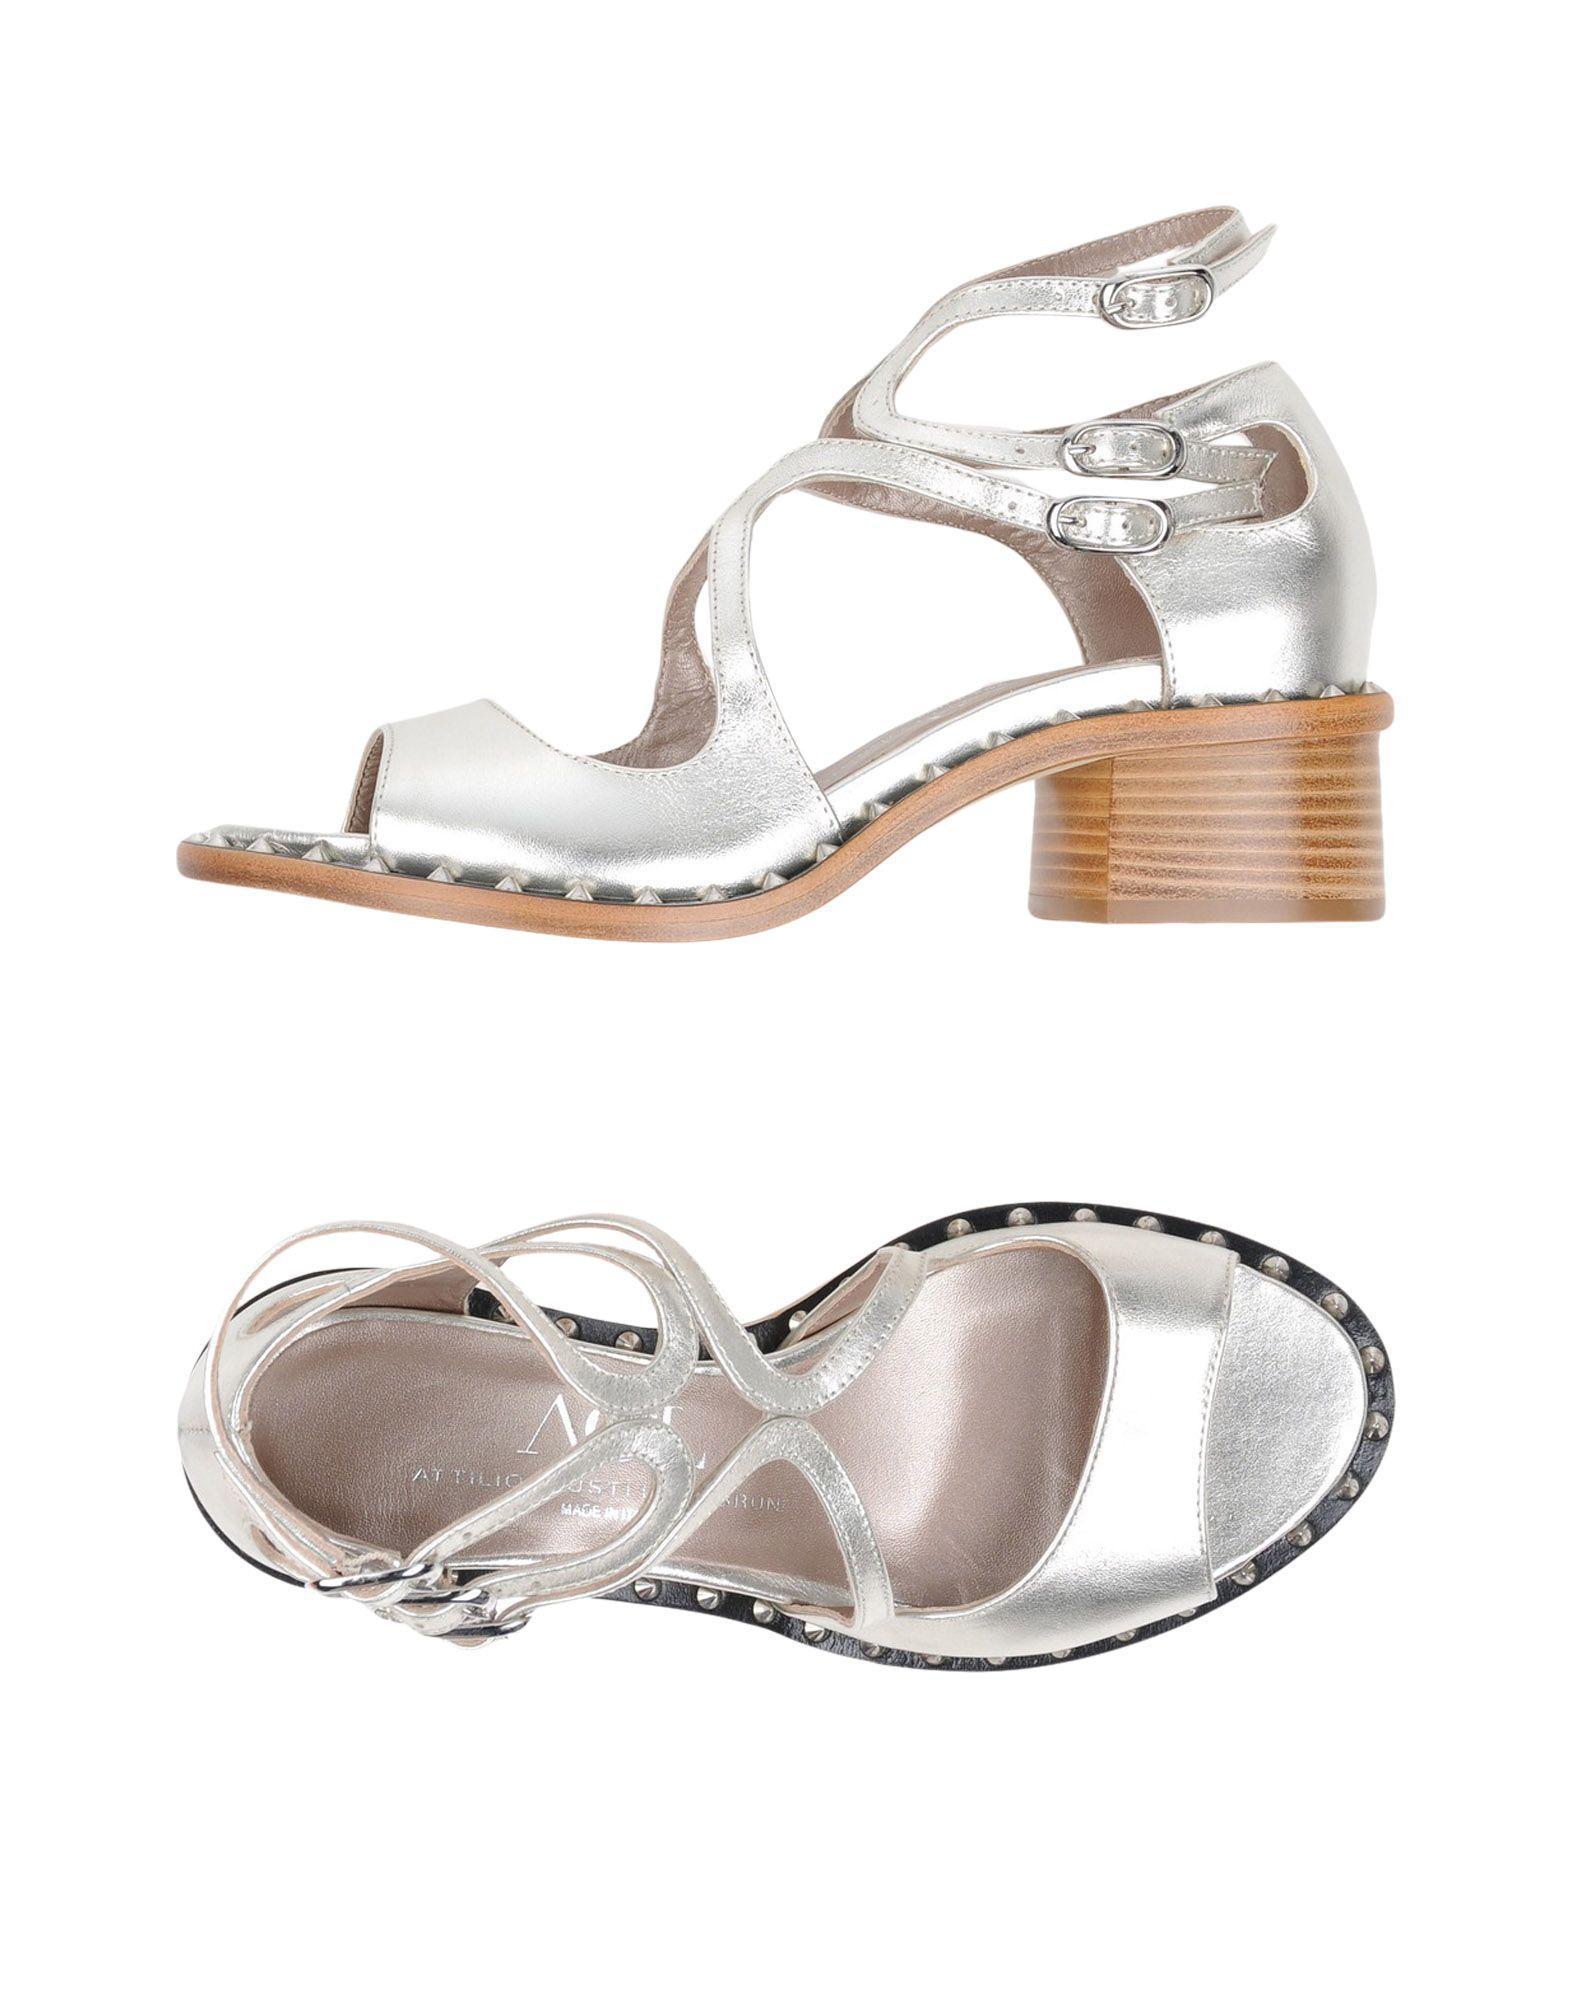 817312d8f4e Agl Attilio Giusti Leombruni Sandals In Platinum